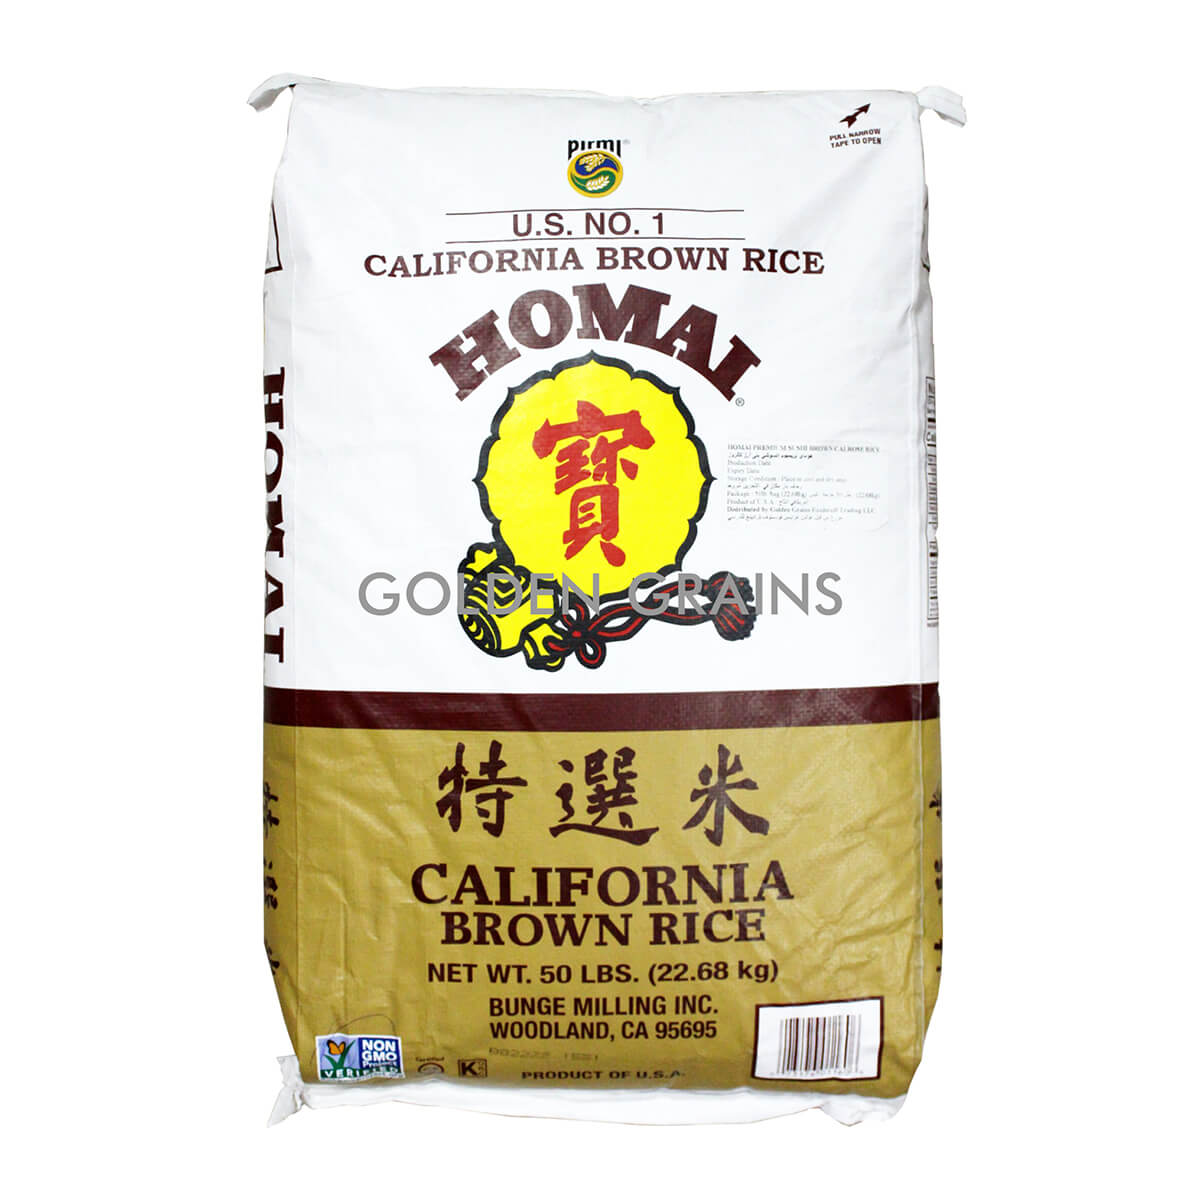 Golden Grains Homai - Cali Brown Rice 22.68KG - Front.jpg